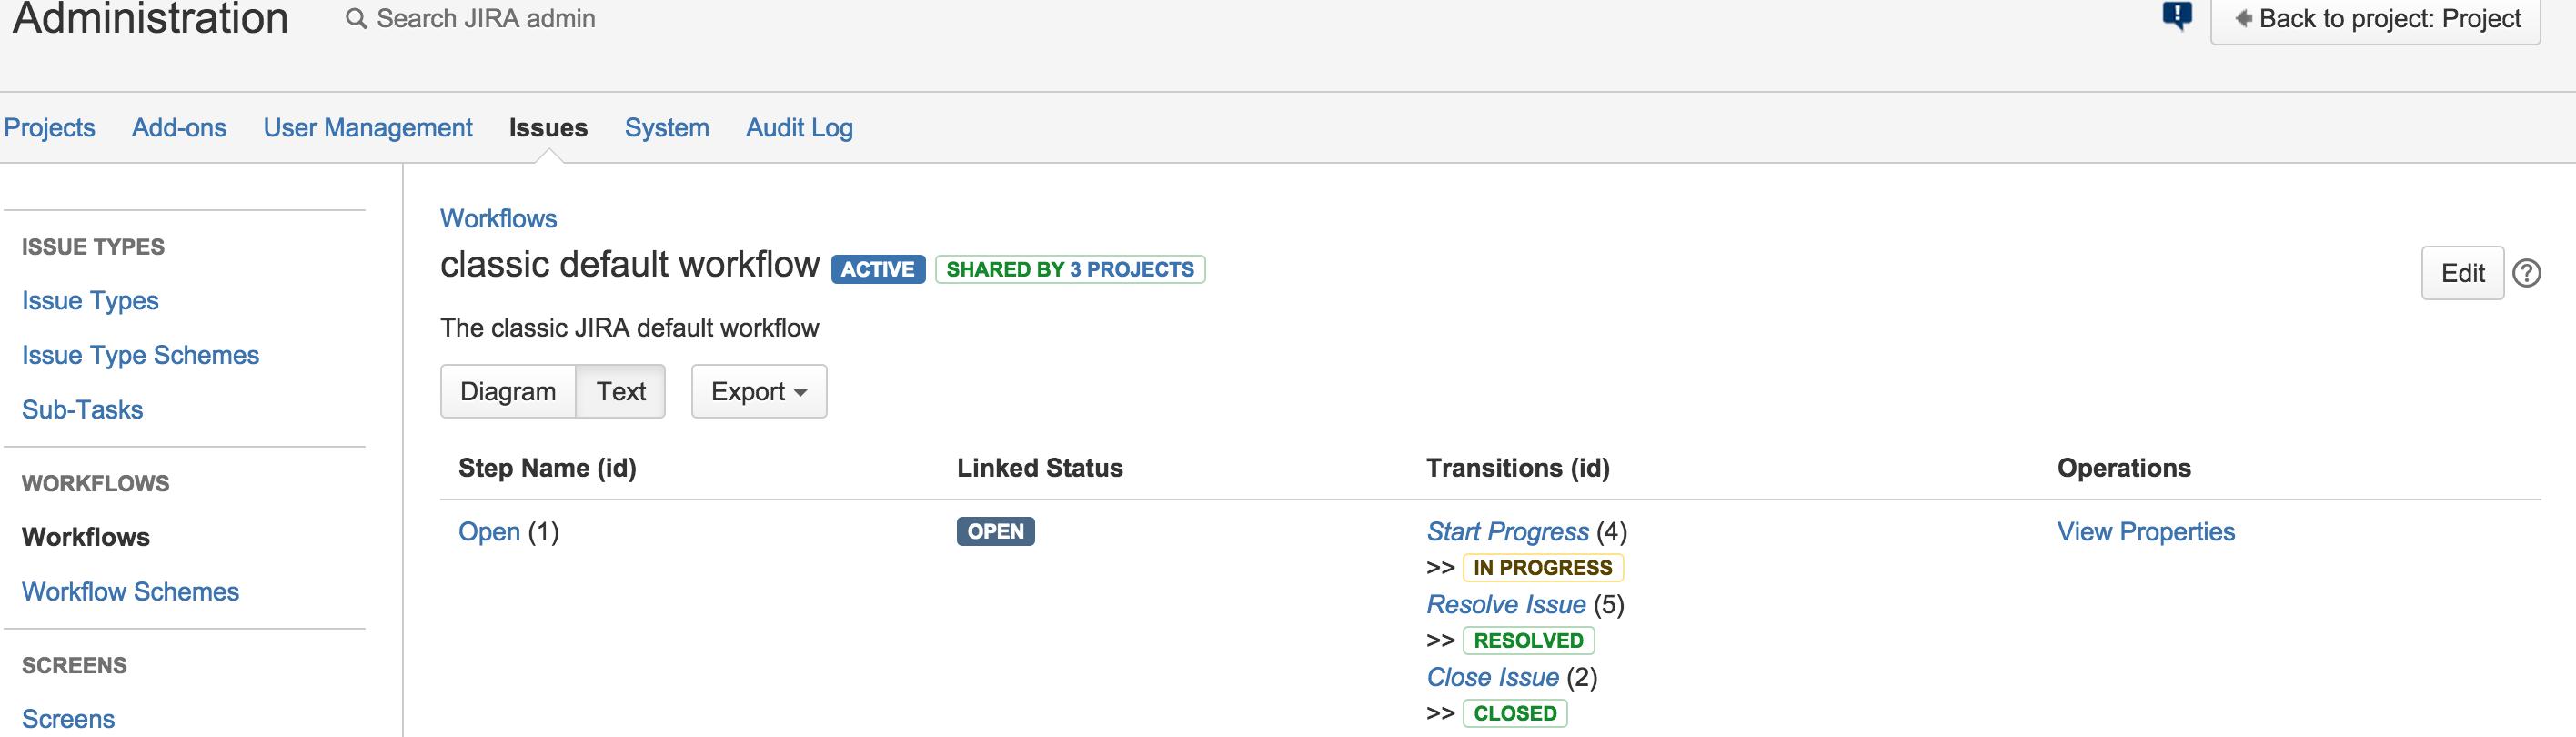 doc/integration/img/jira_workflow_screenshot.png